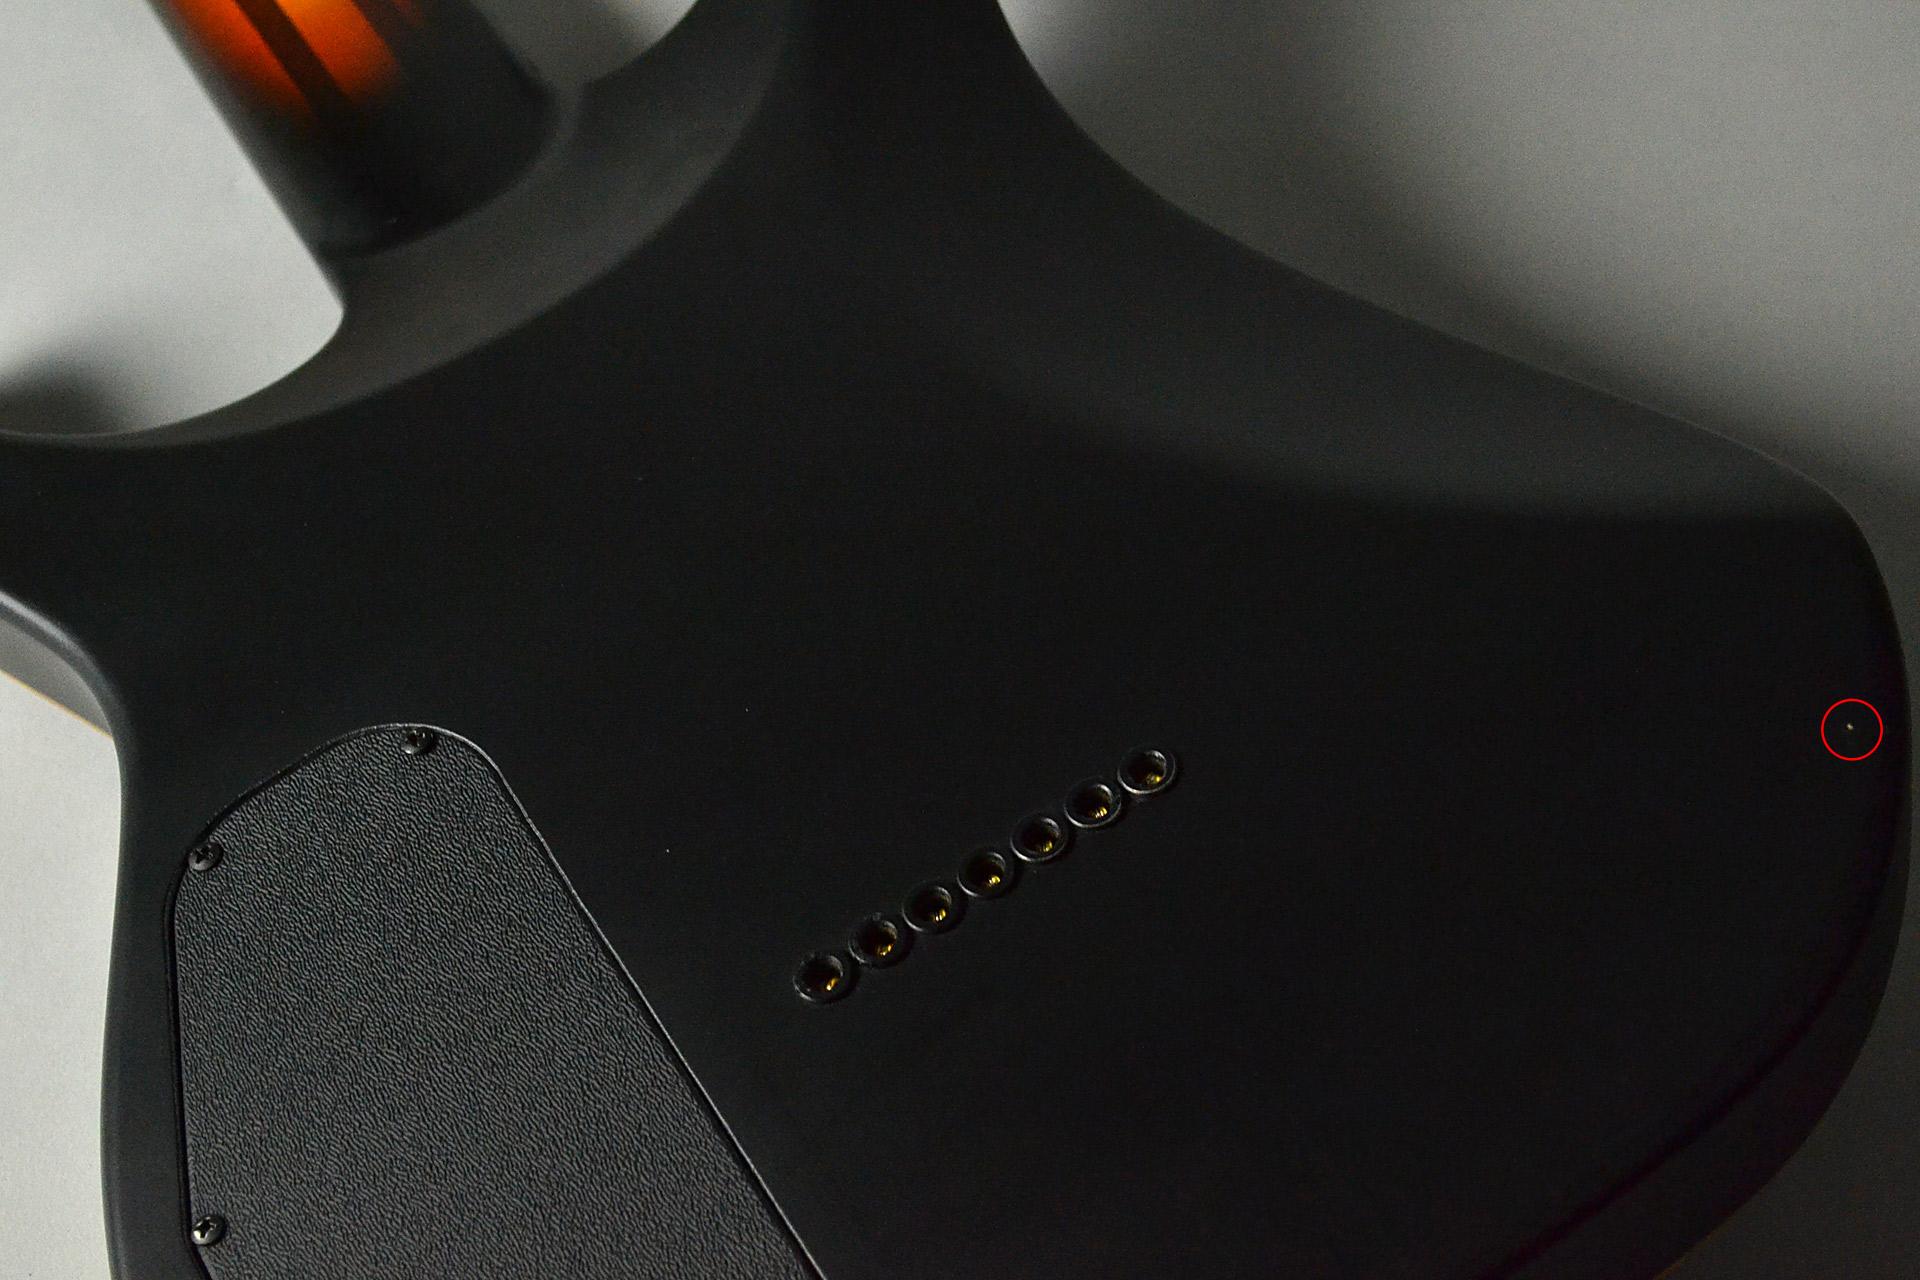 Cobra SPL7 HT/T FCM 4CS Flame Crotch Maple【リペア済み品・大特価】のボディバック-アップ画像